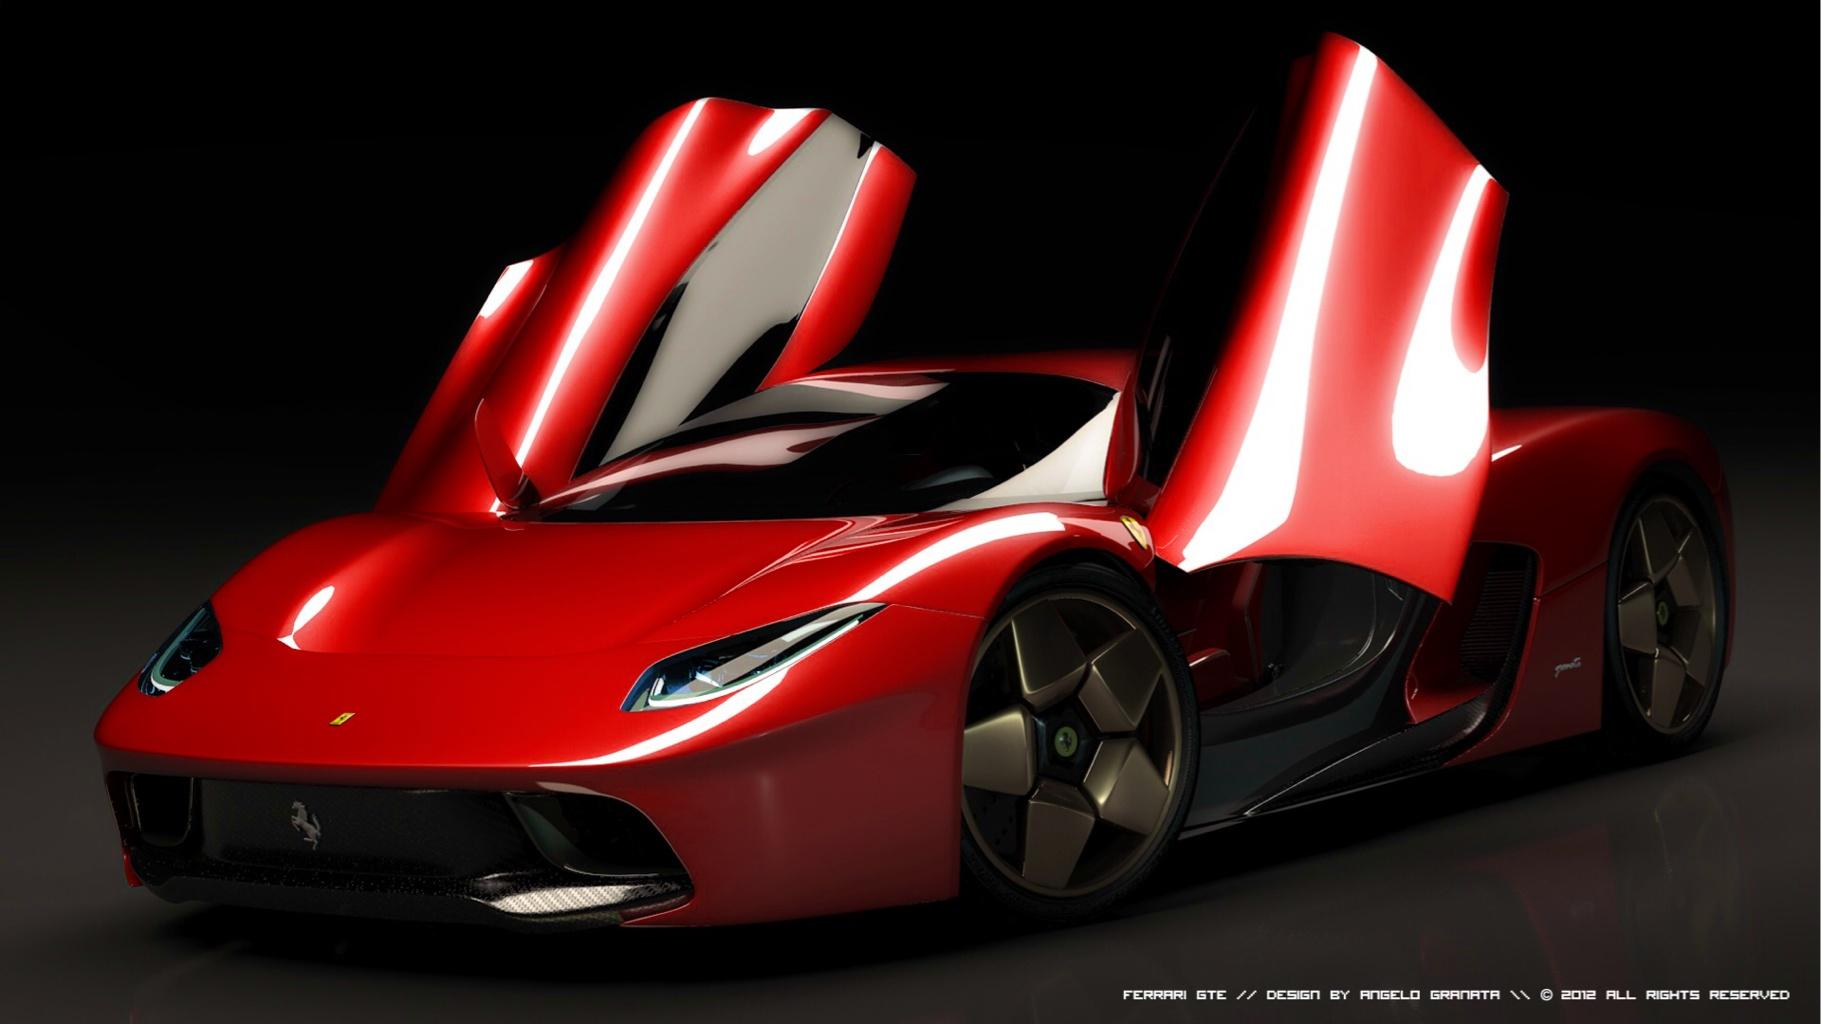 Super belle voiture 17 18 pearltrees - Image belle voiture ...